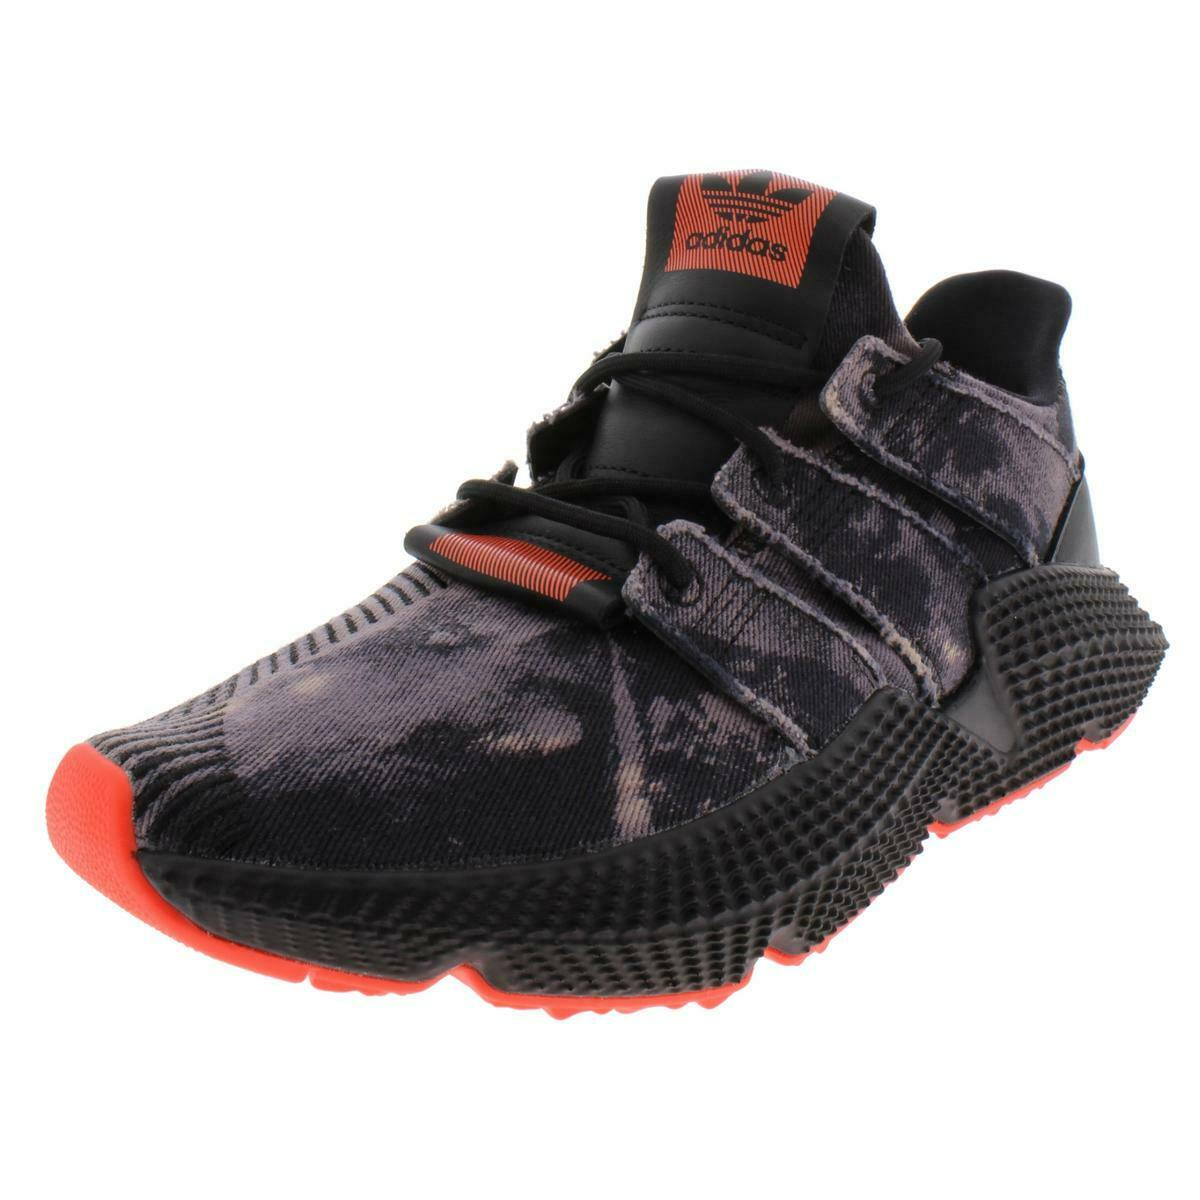 Adidas Originals Mens Prophere Denim Running Athletic shoes Sneakers BHFO 3792